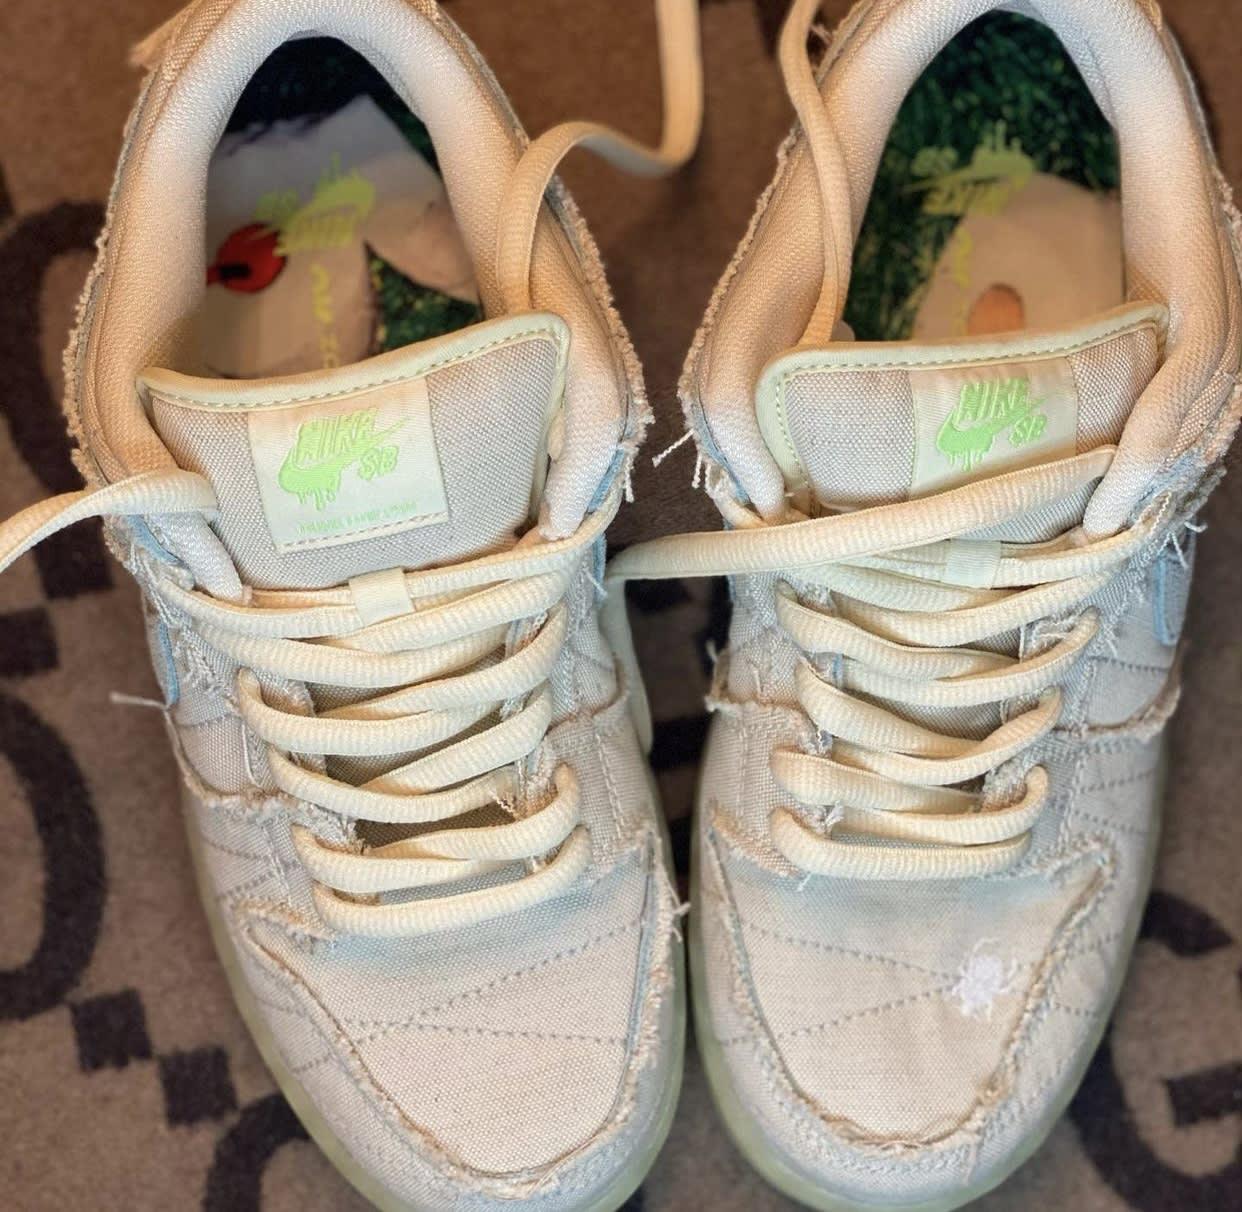 Nike SB Dunk Low Mummy Halloween DM0774-111 Top